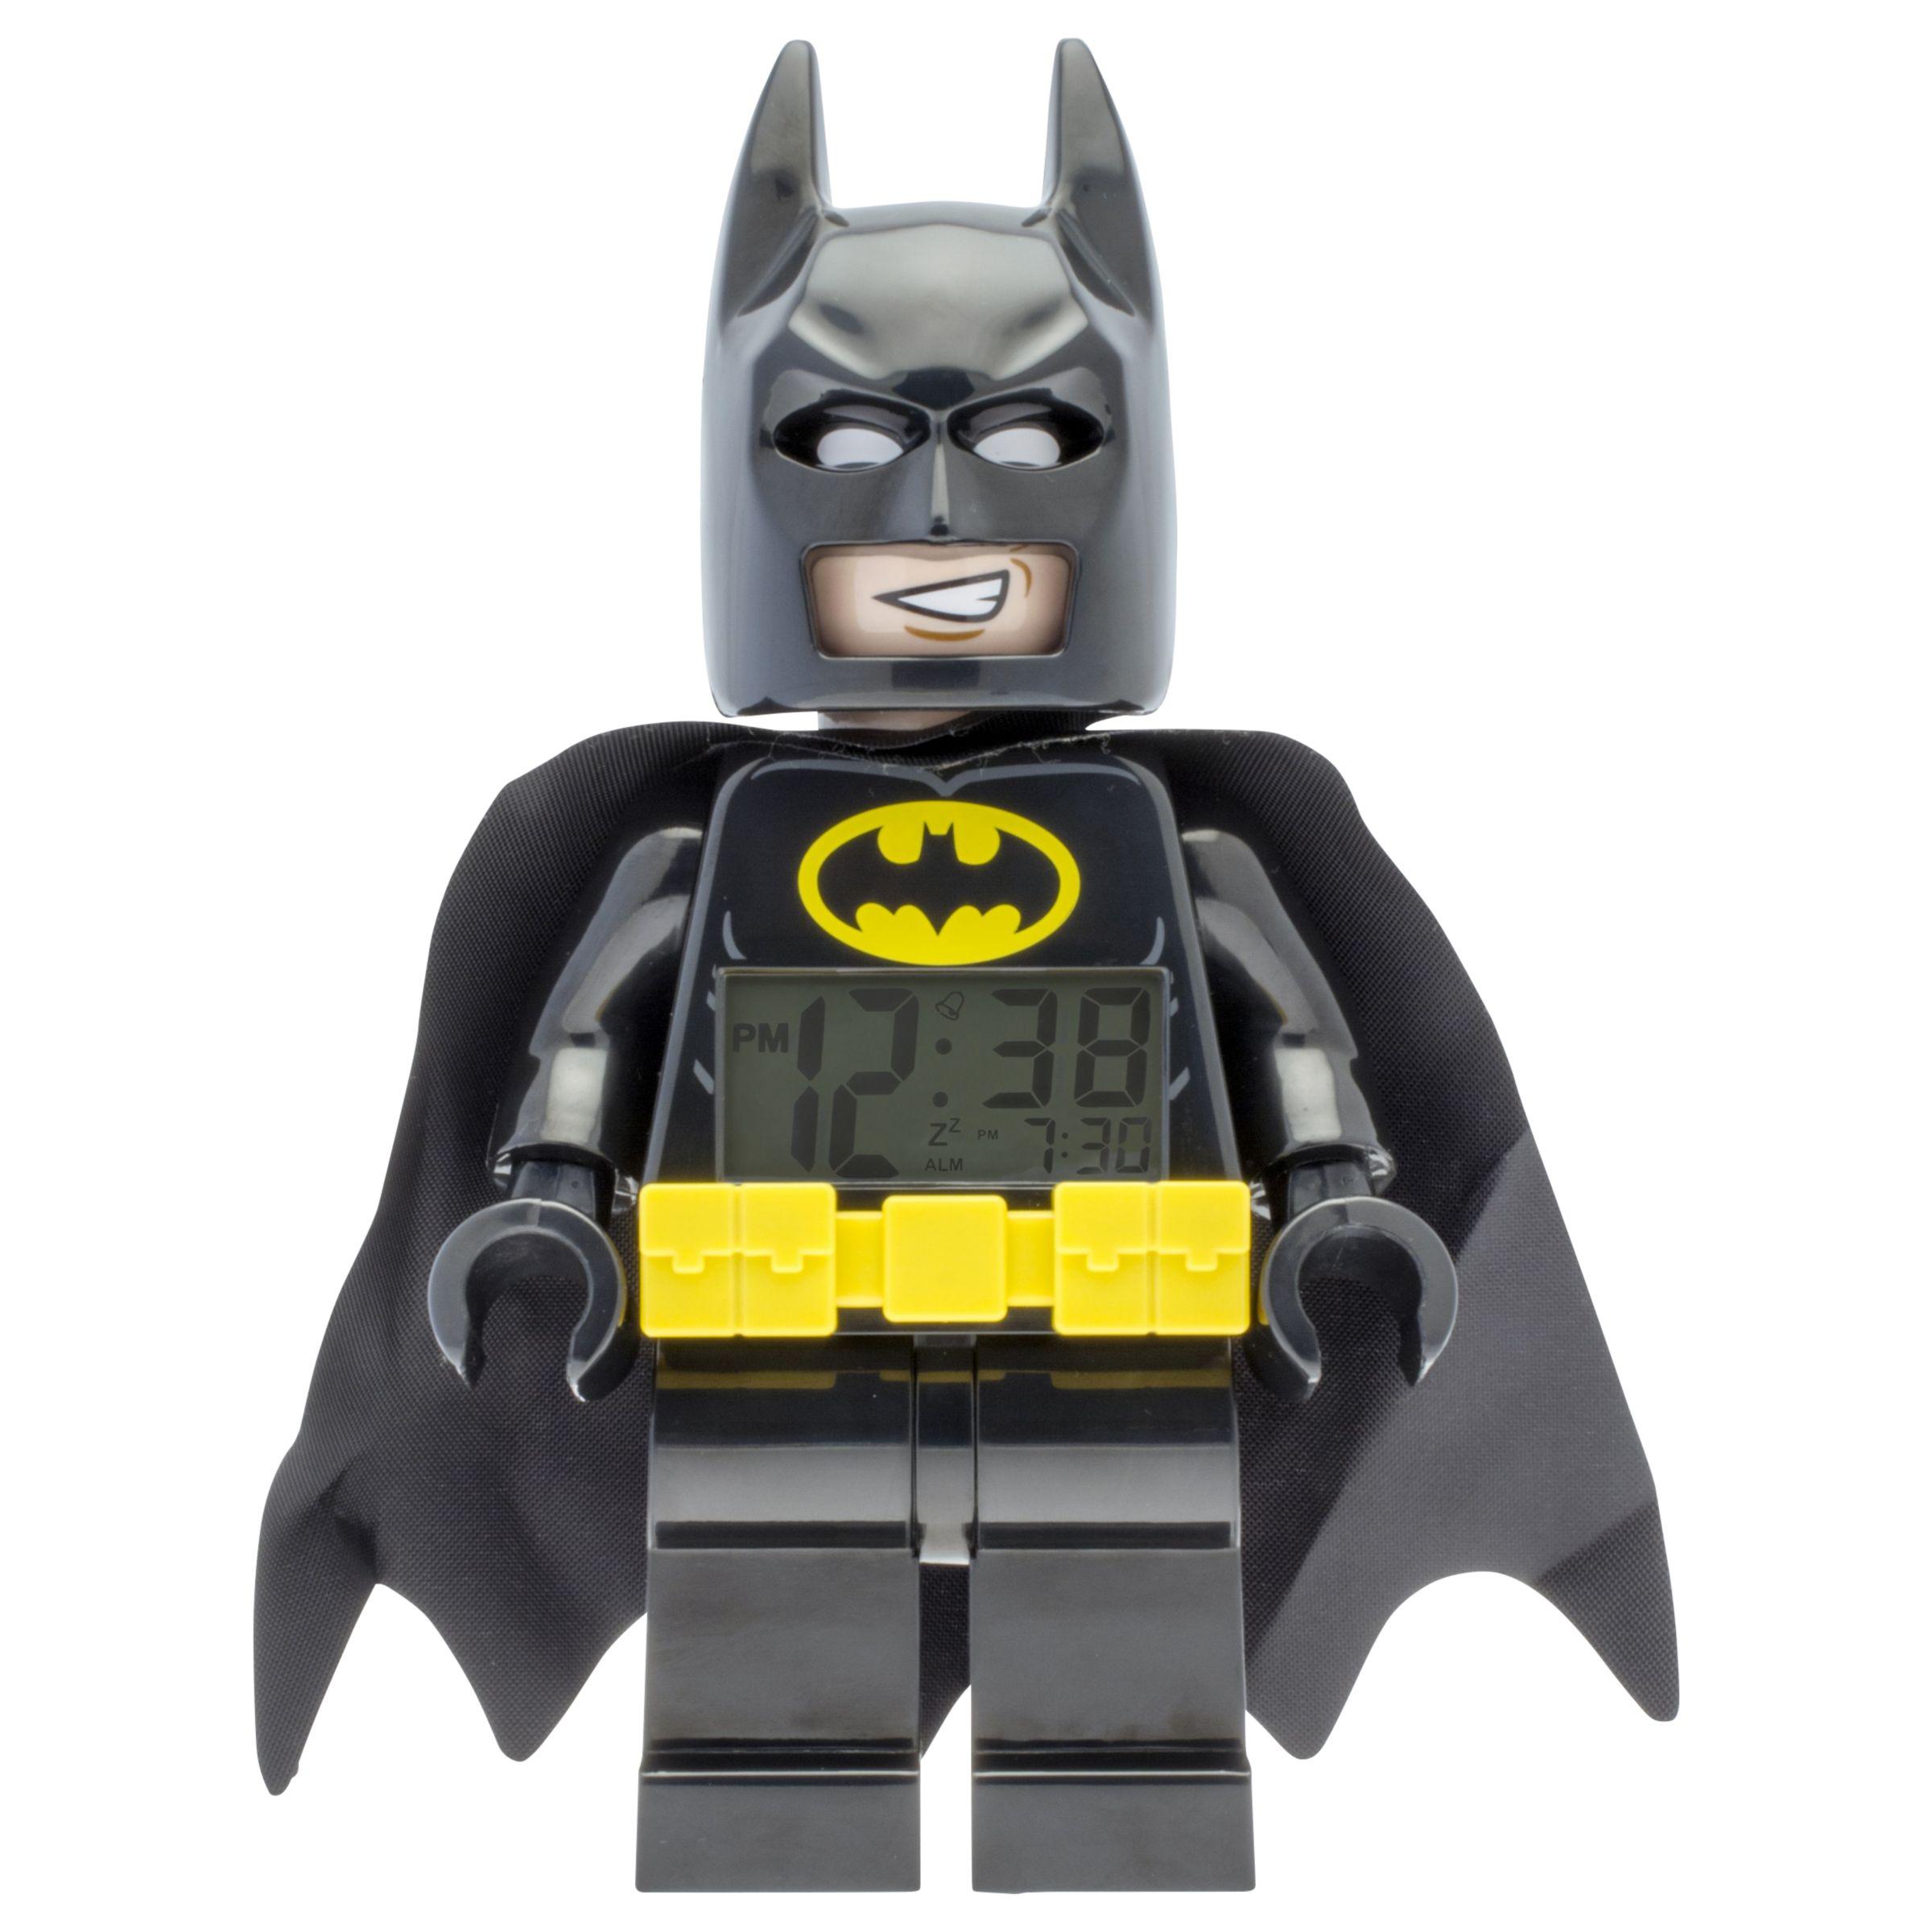 Lego LEGO 9009327 The LEGO Batman Movie Batman Clock